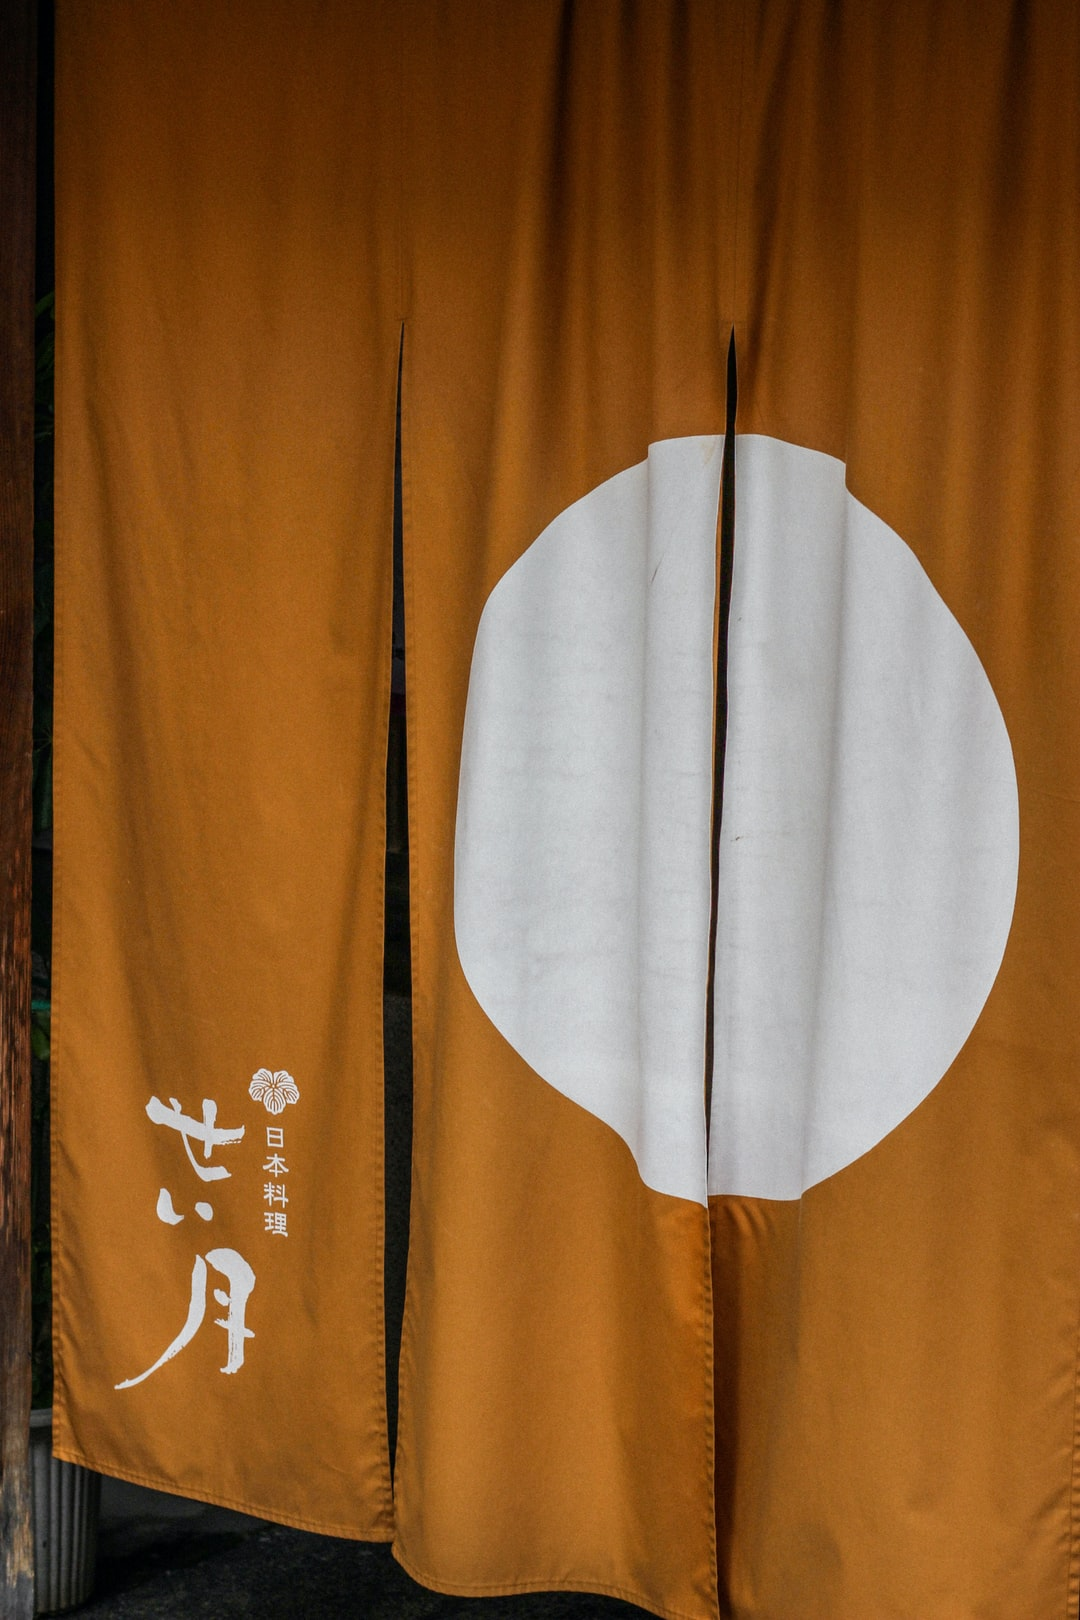 Kanazawa. Japan.